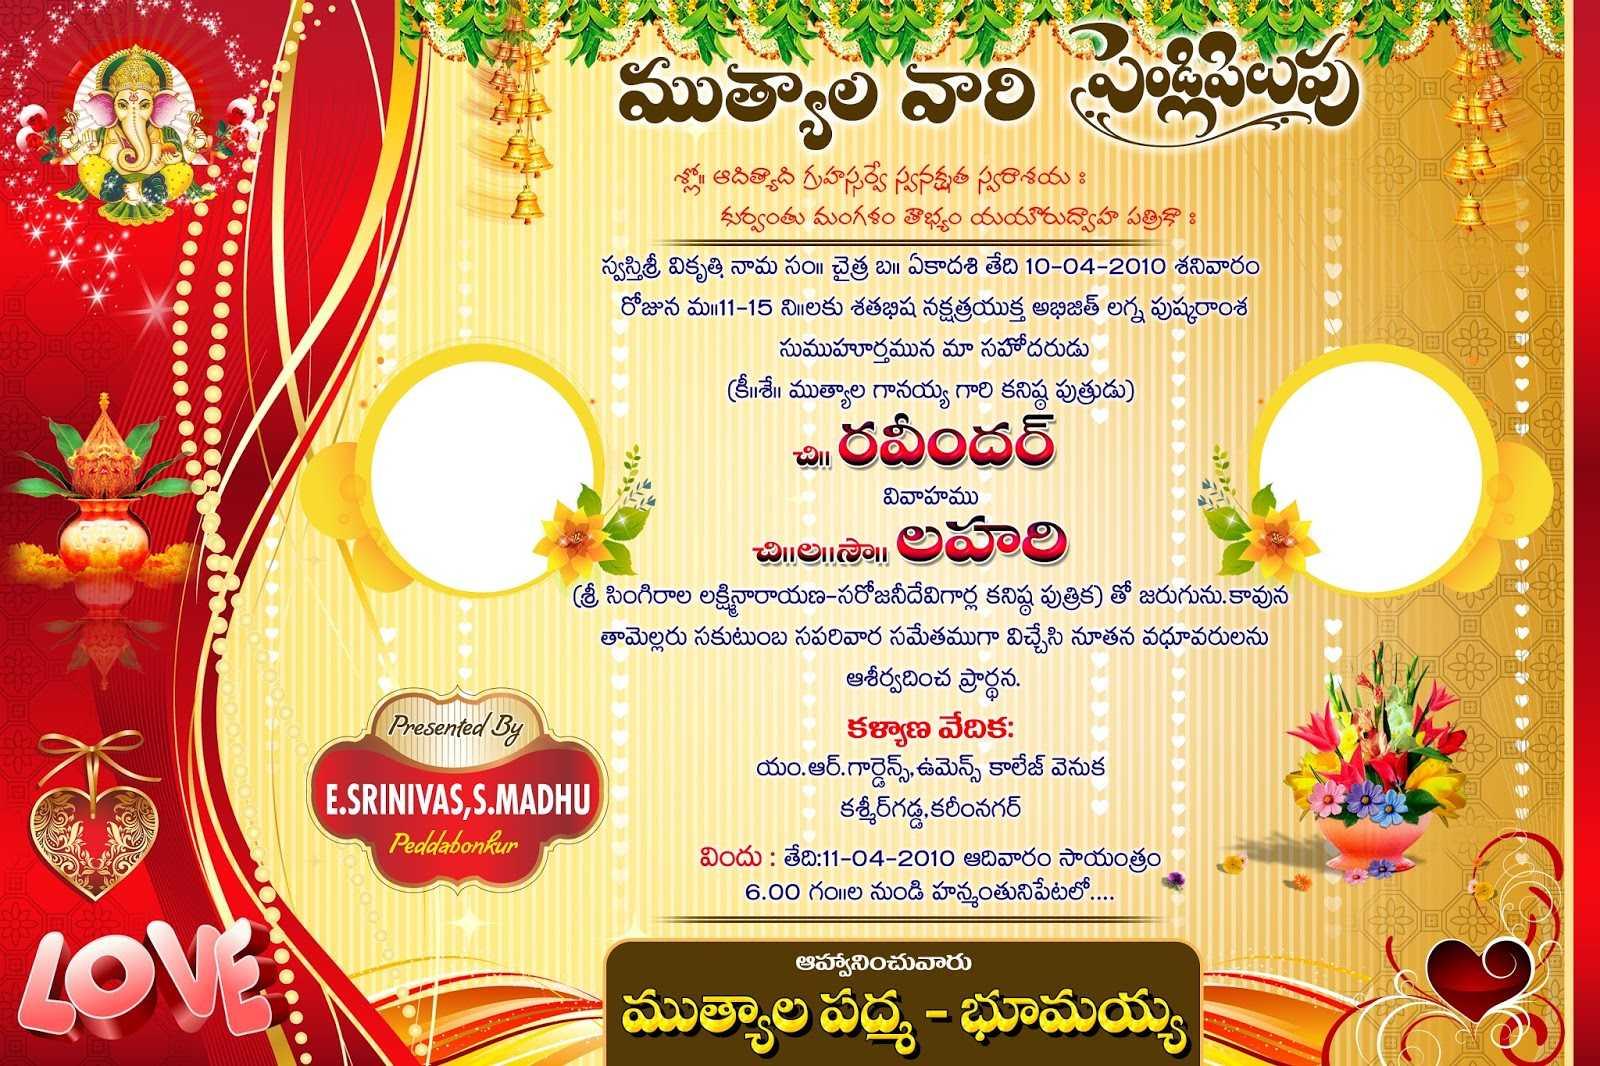 Indian Wedding Invitation Card Designs Free Download With Regard To Indian Wedding Cards Design Templates